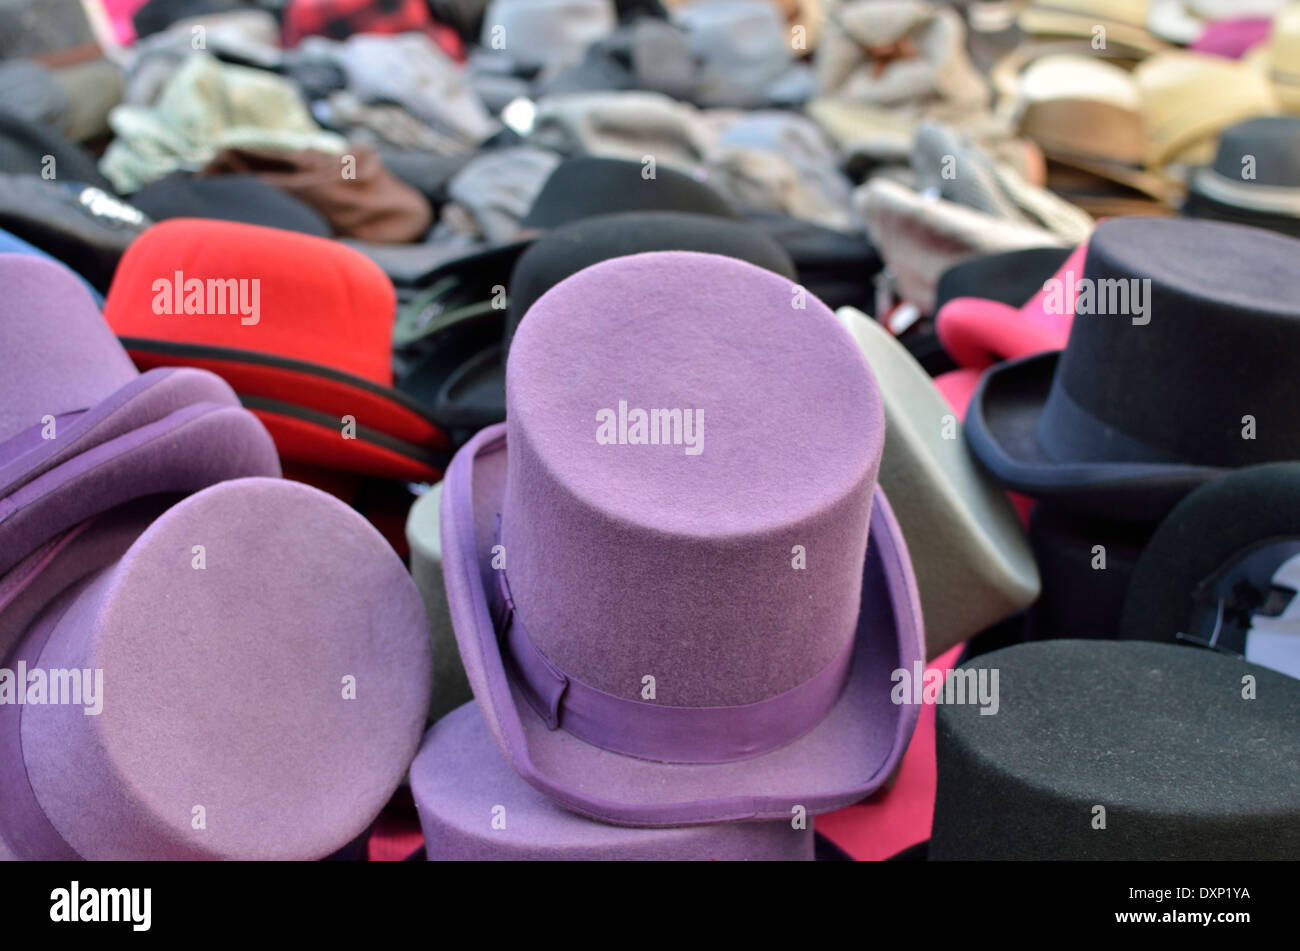 Top hats on display on a market stall, Portobello Road, Notting Hill, London, UK - Stock Image